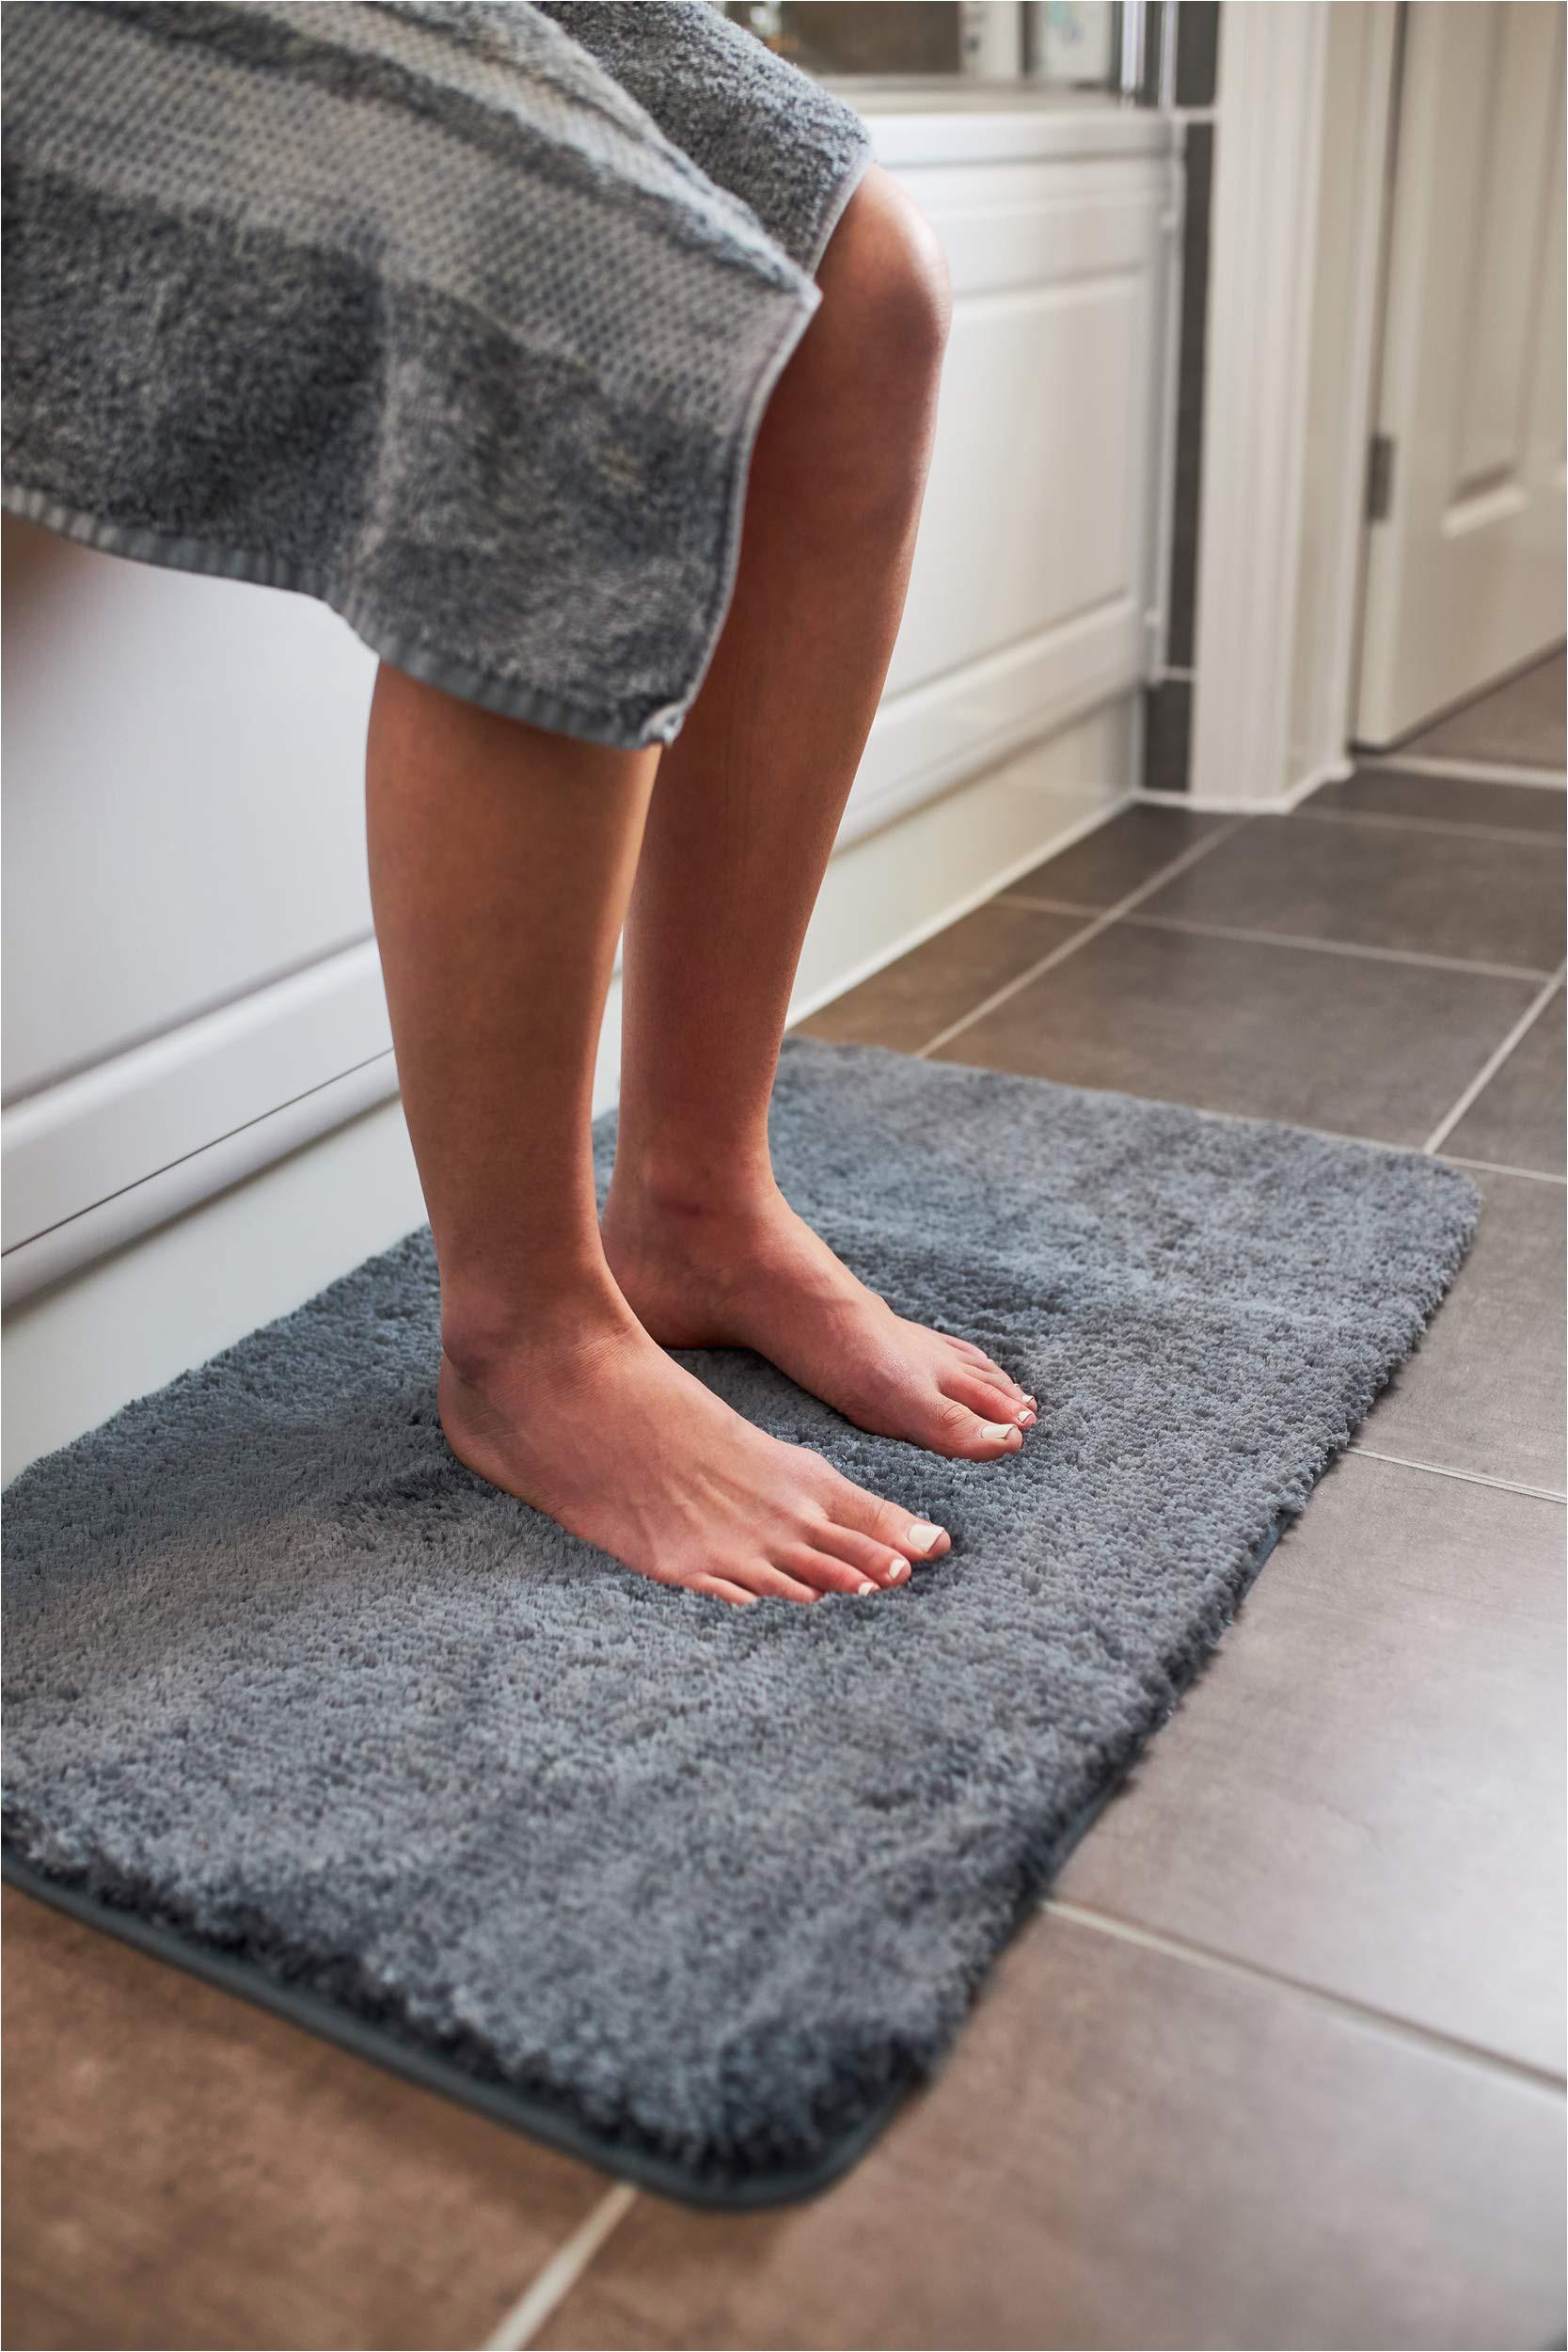 Designer Bath Mats Rugs Luxury Grey Bath Mat Microfiber Non Slip Bath Rug with Super soft Absorbent Dry Fast Design for Bath and Shower